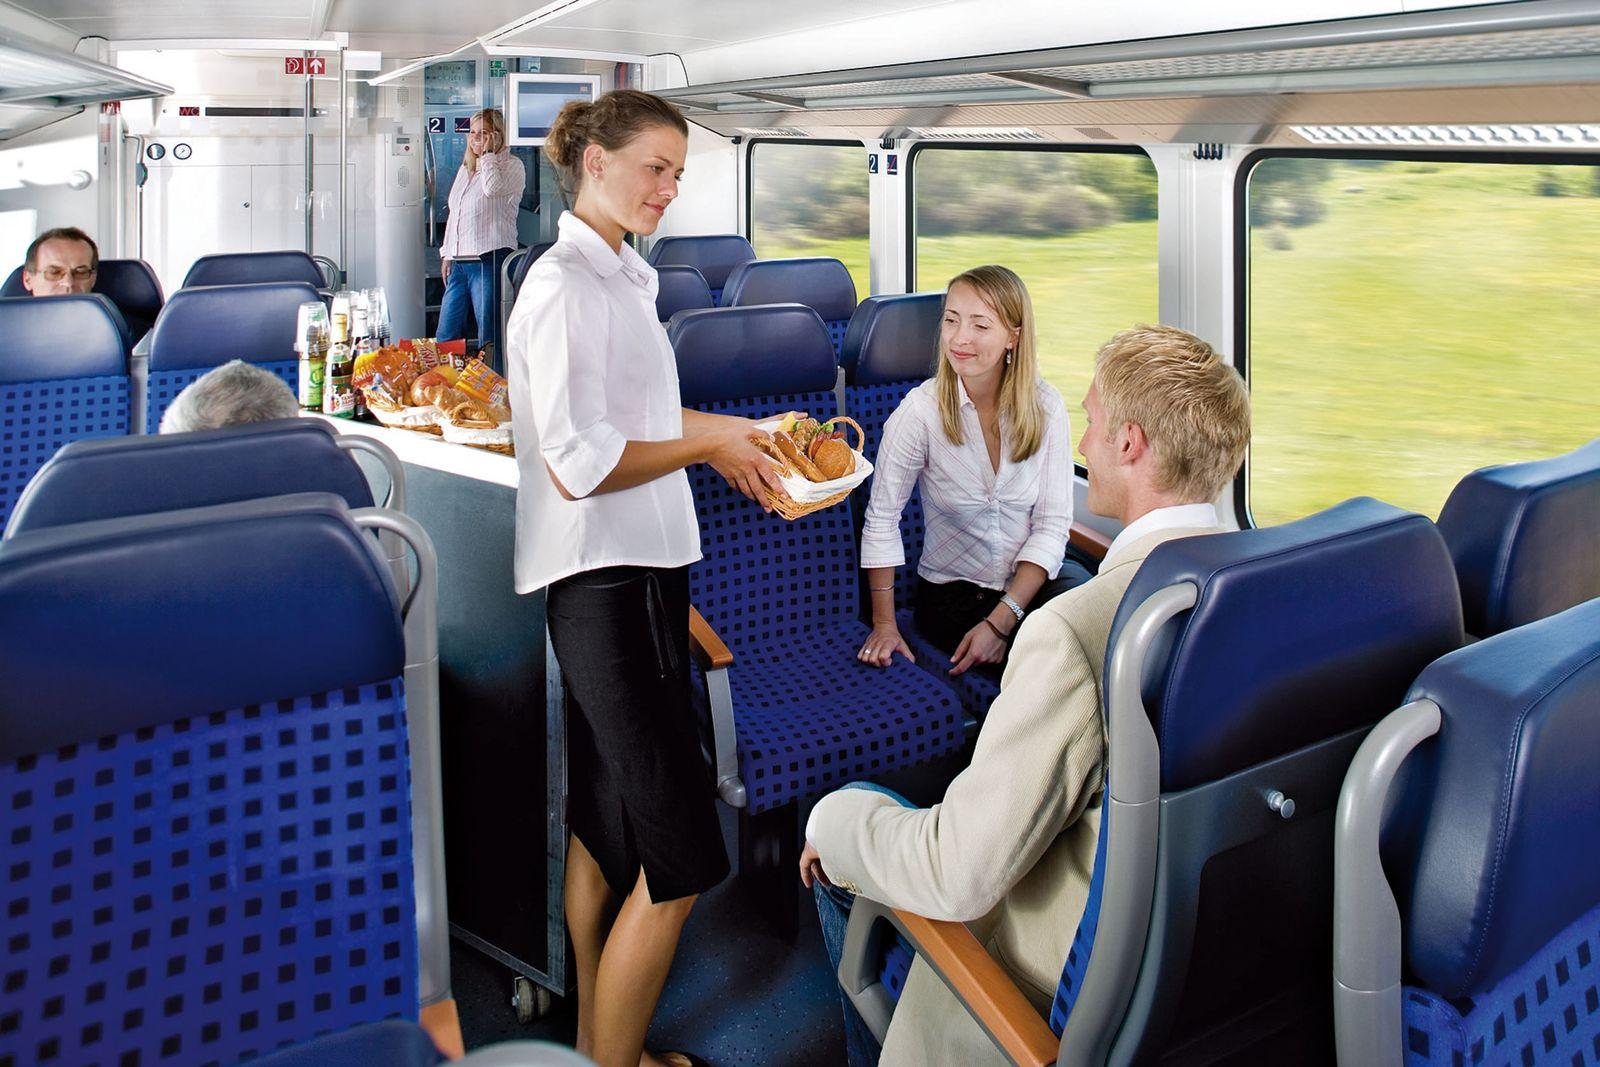 Bahn / Catering